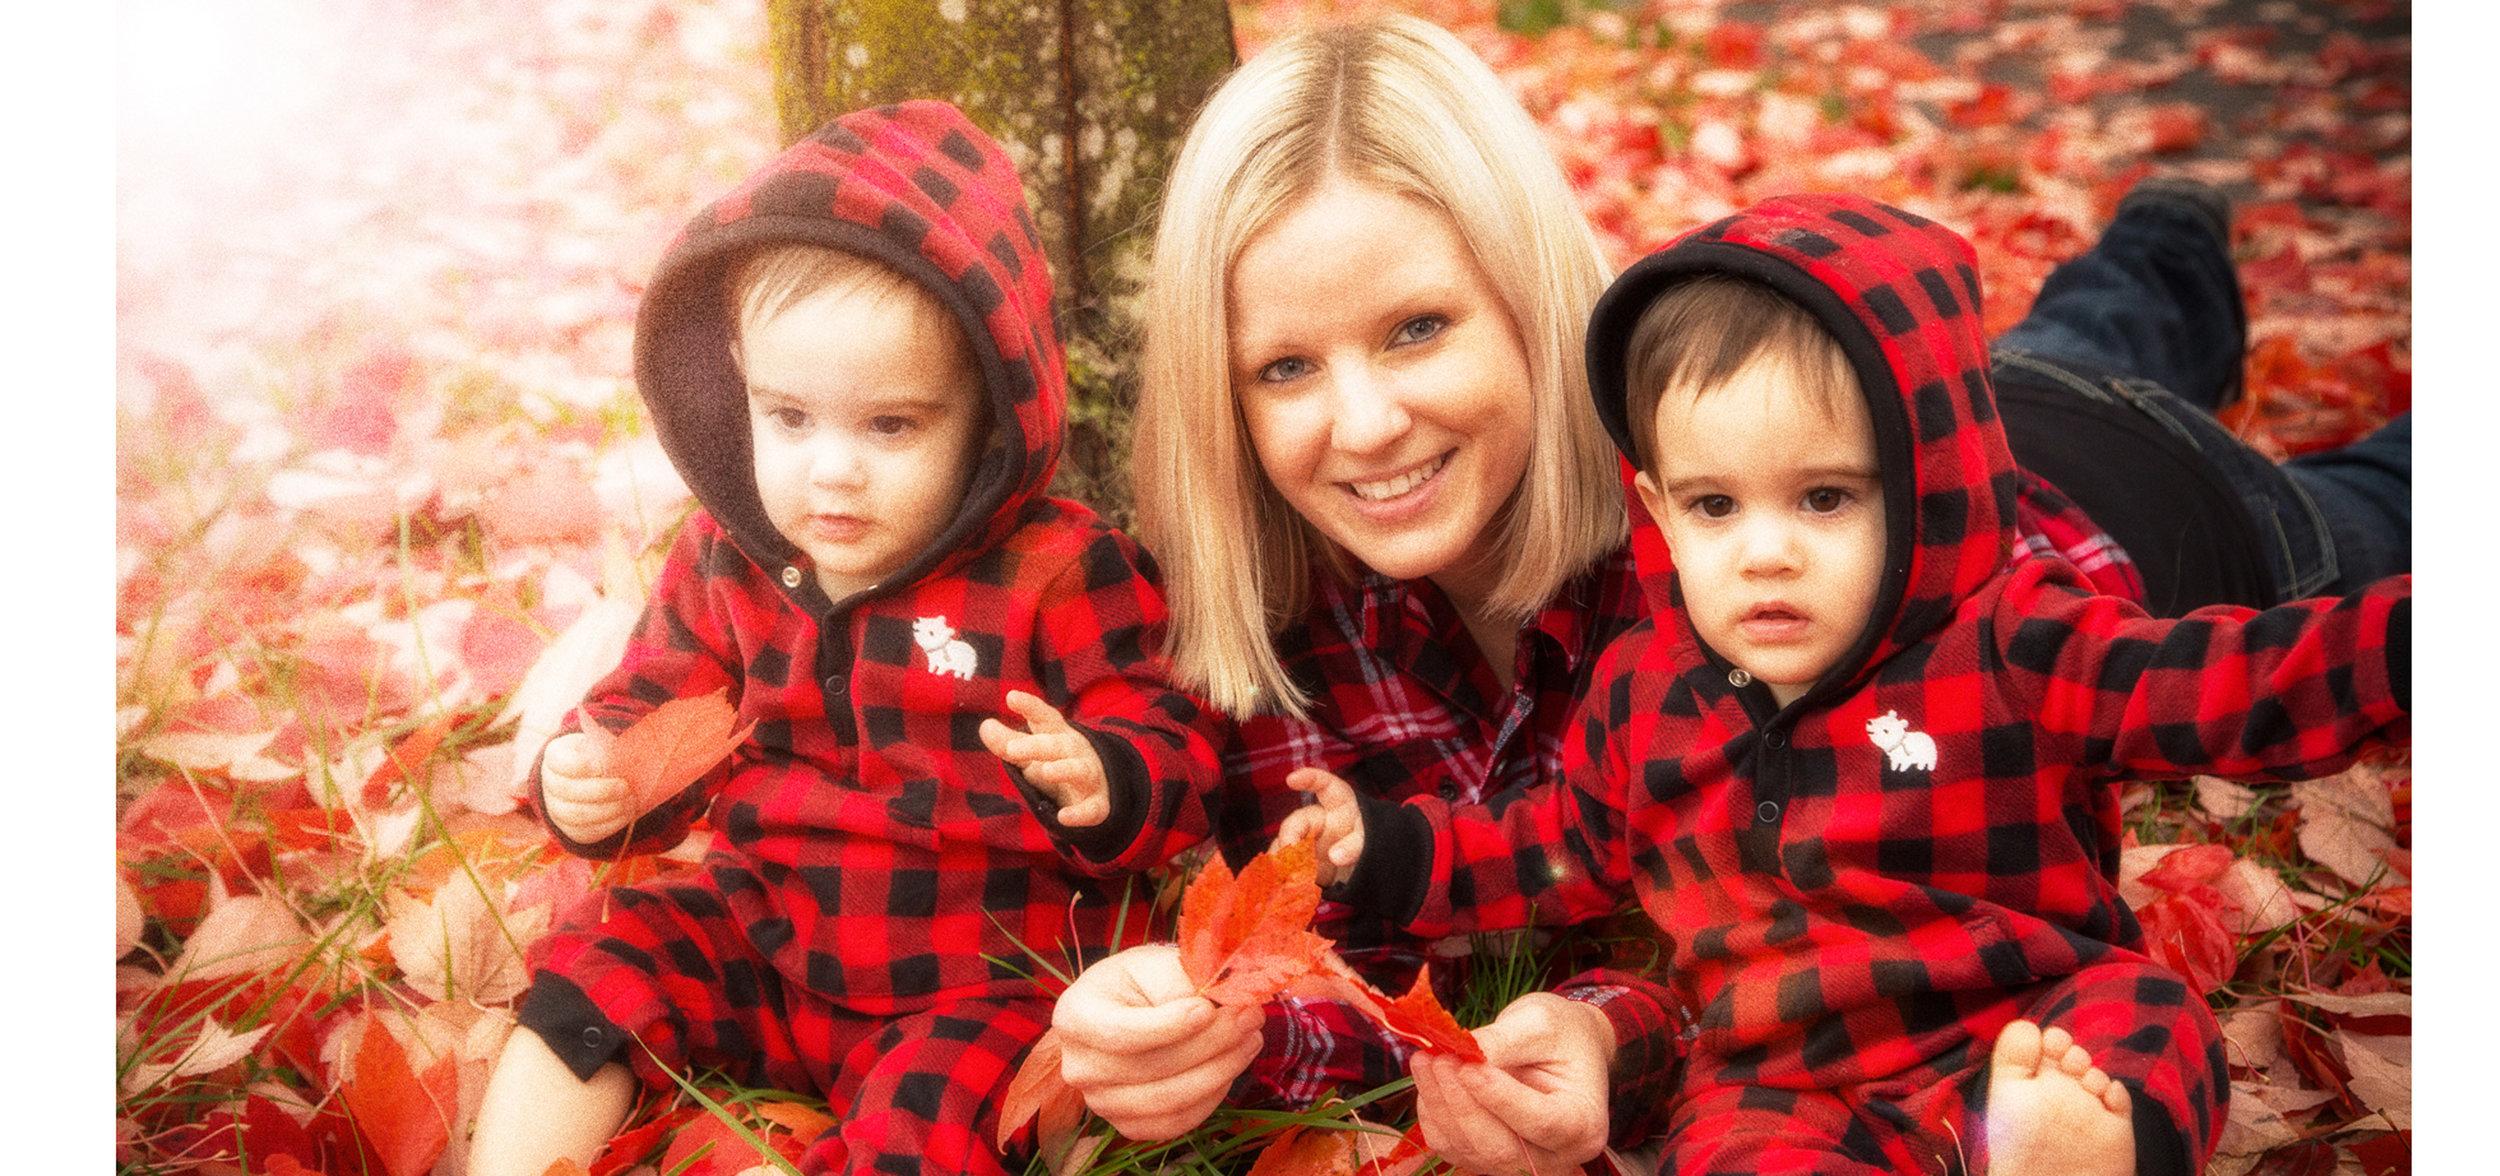 Arty woman and kids photos Eugene Oregon fall.jpg